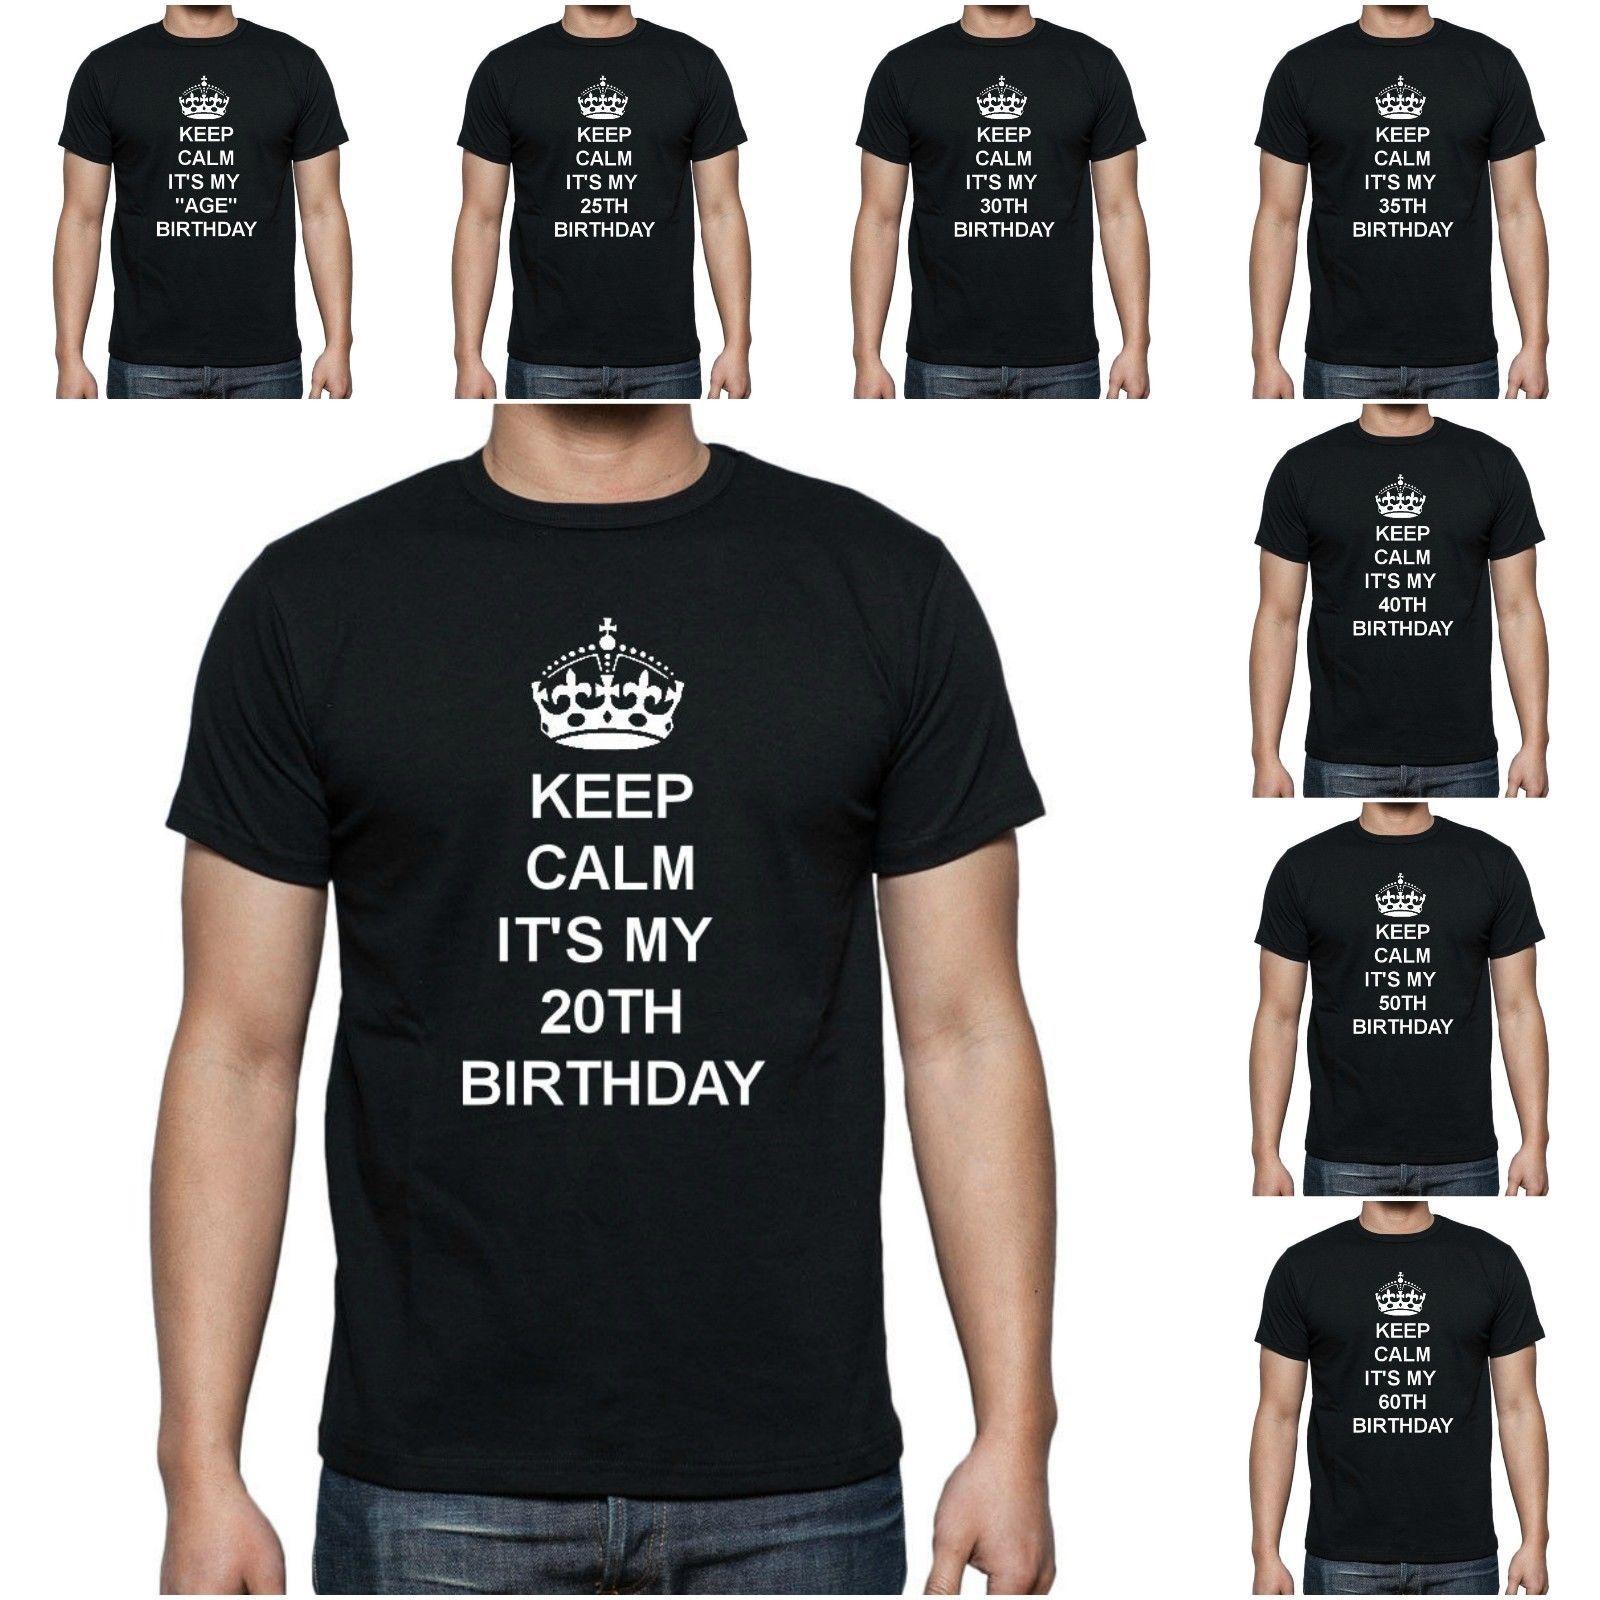 26baf335e NEW WOMENS MENS KIDS KEEP CALM BIRTHDAY 20TH 30TH 40TH GIFT T SHIRT AGE 1  6XL Cool T Shirts Designs Make T Shirts Online From Cls6688523, $13.91   DHgate.Com